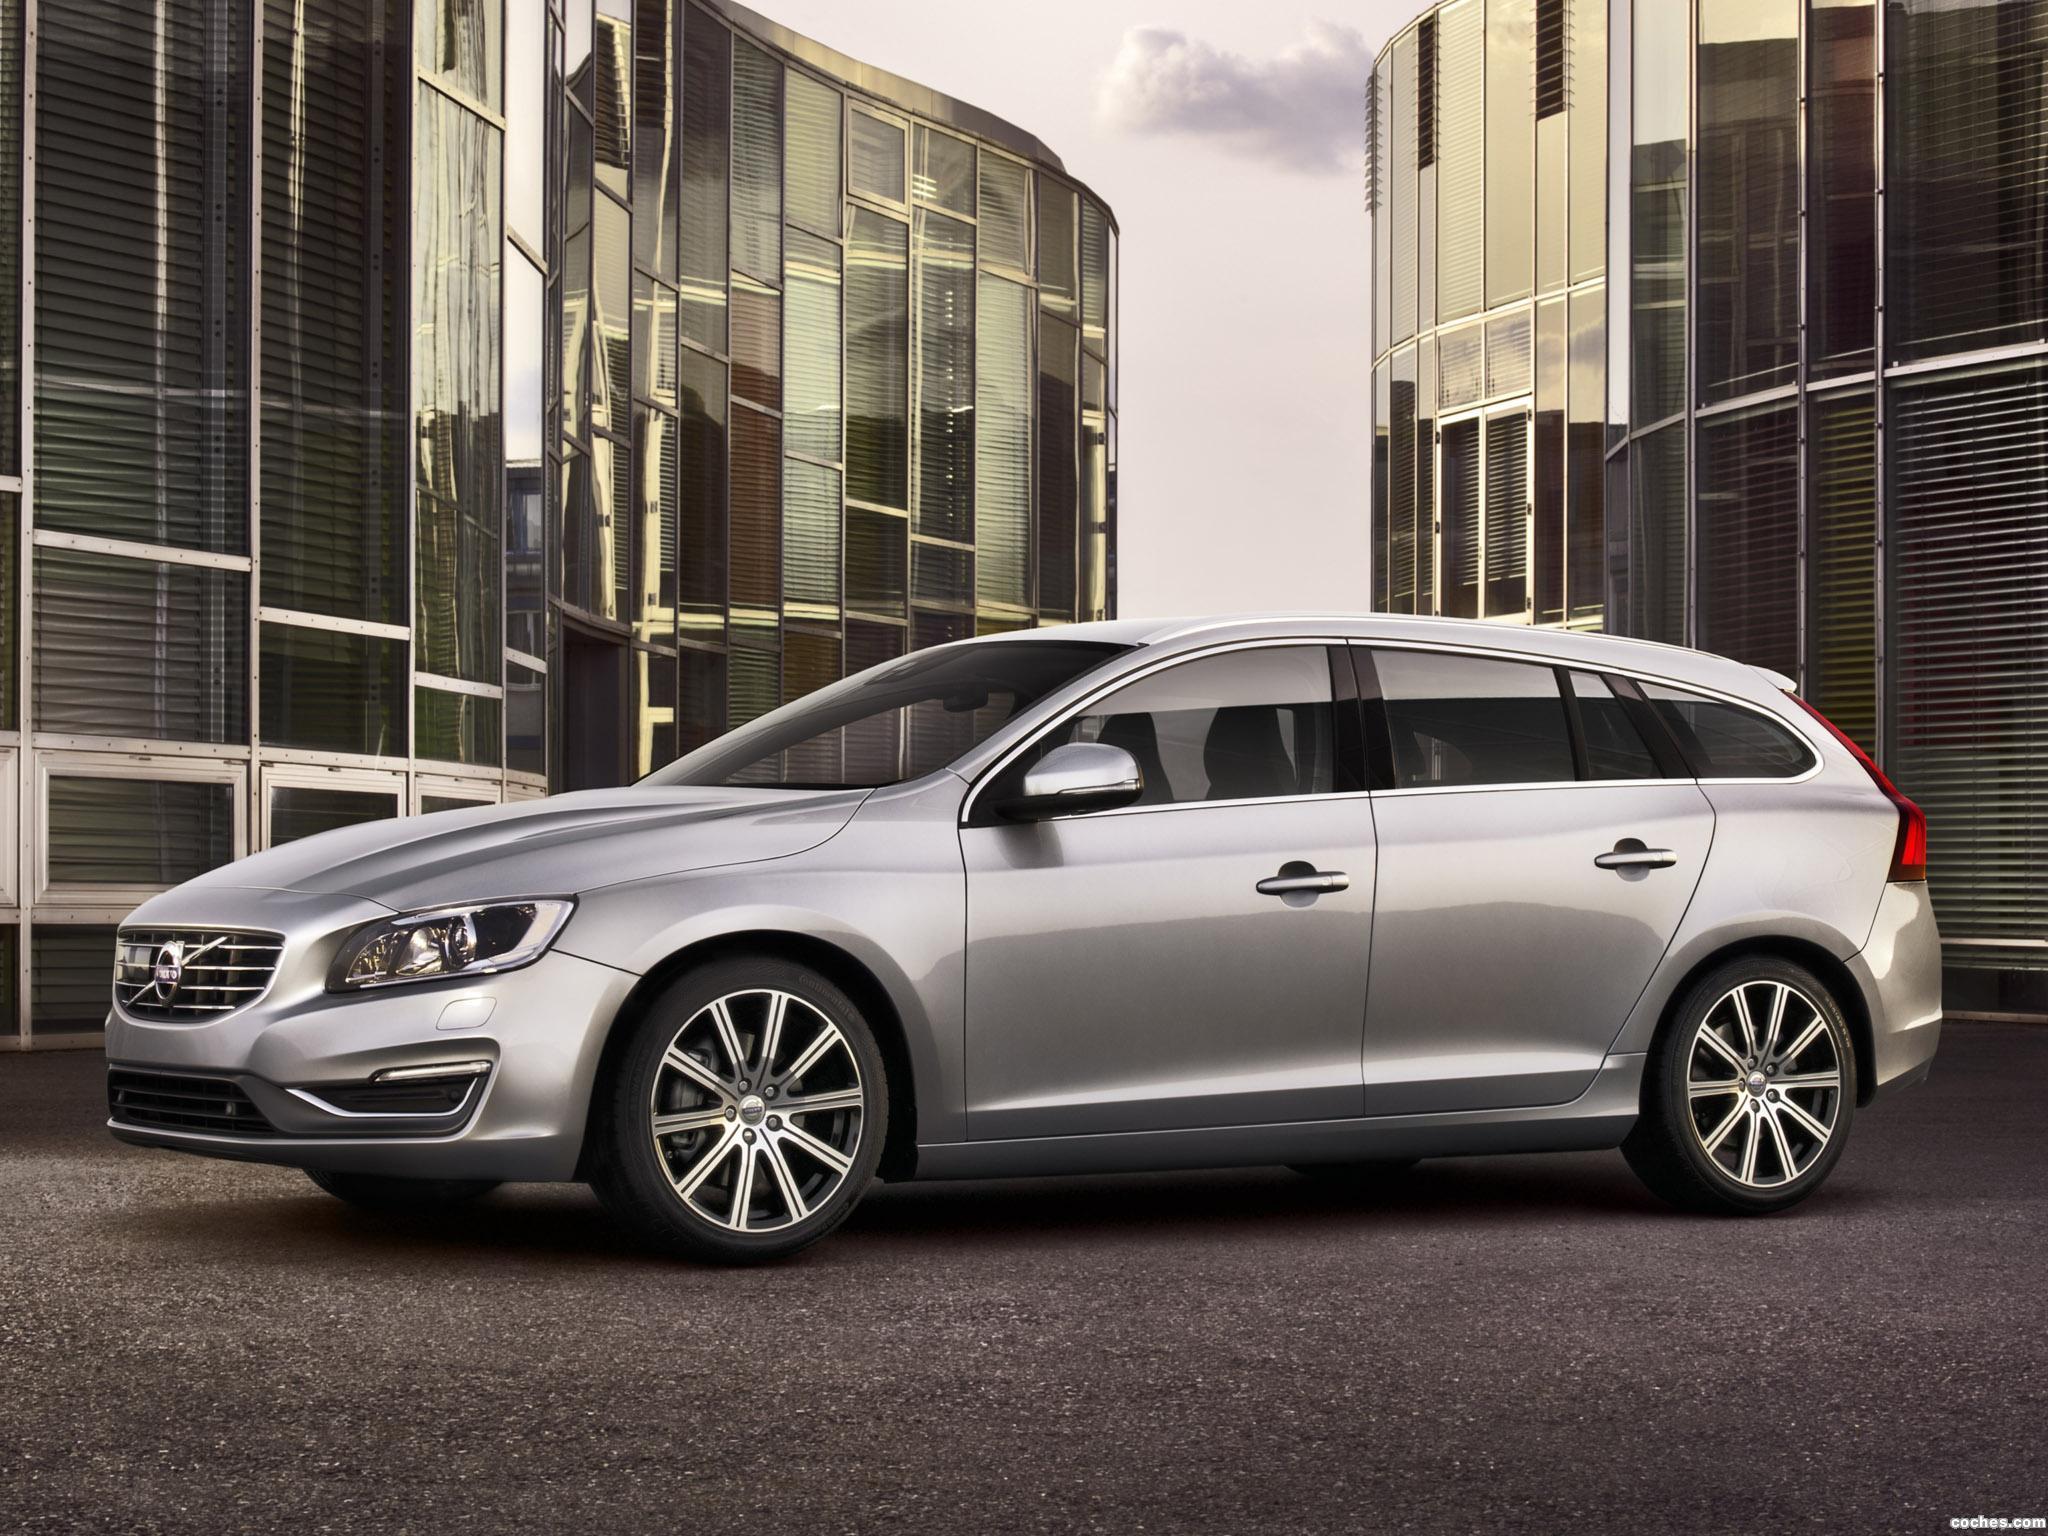 Foto 0 de Volvo V60 2013